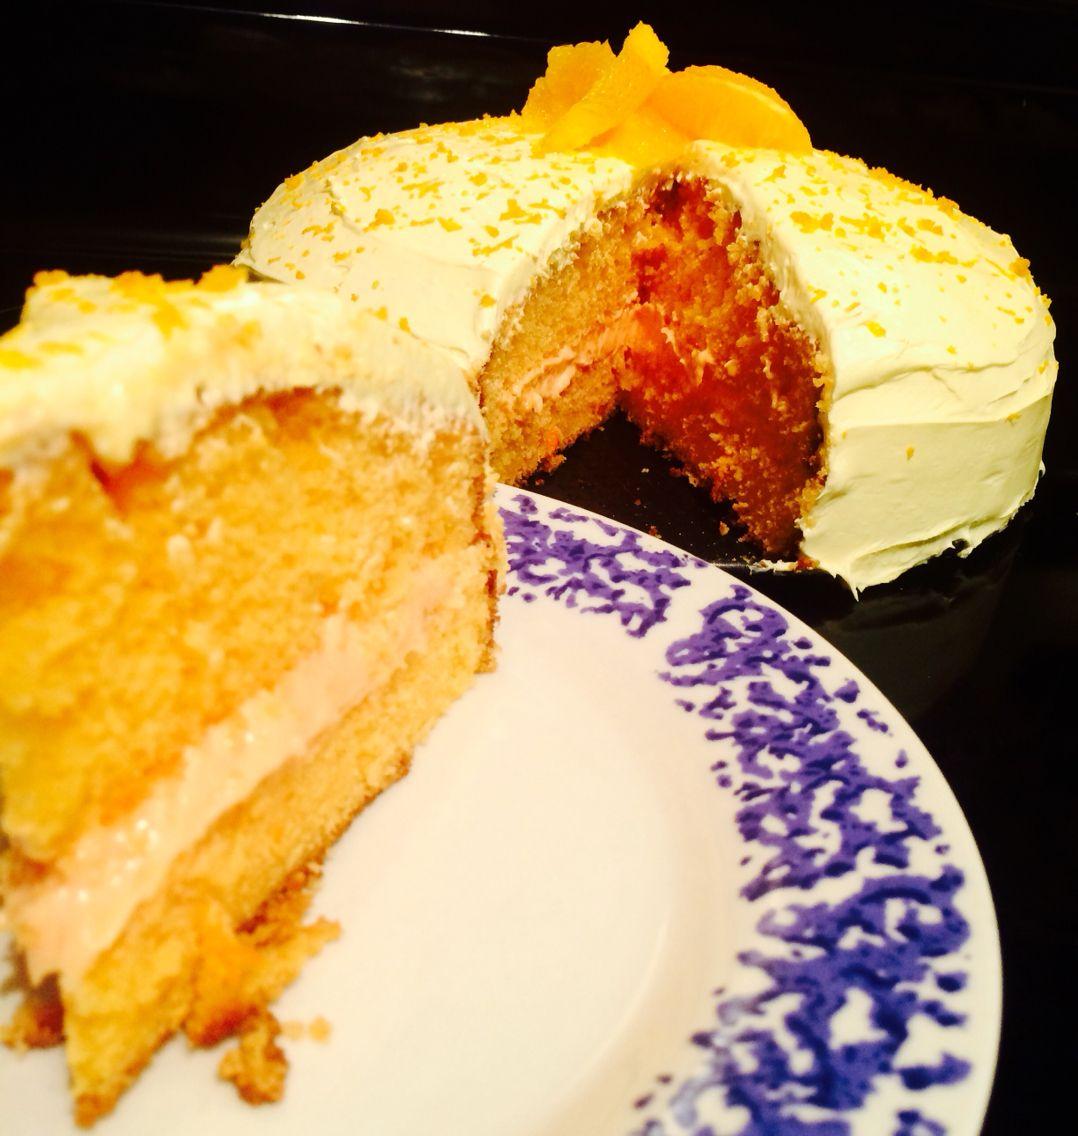 2 layer 9inch orange crush soda cake with butter cream